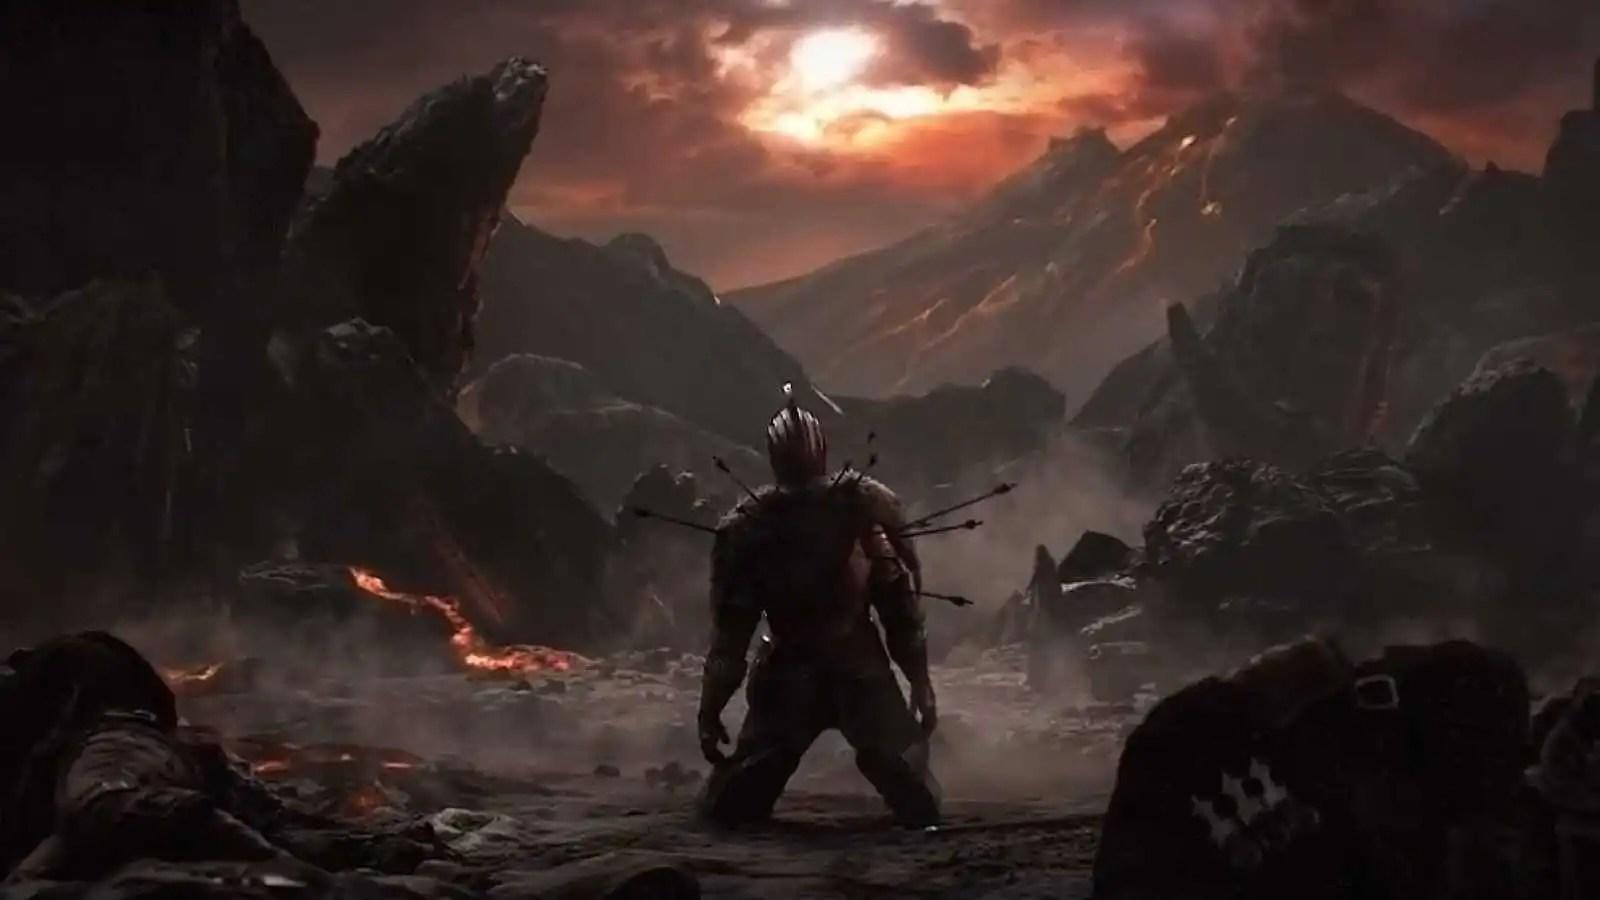 Kotaku: anche Dark Souls 2 e 3 potrebbero arrivare su Nintendo Switch